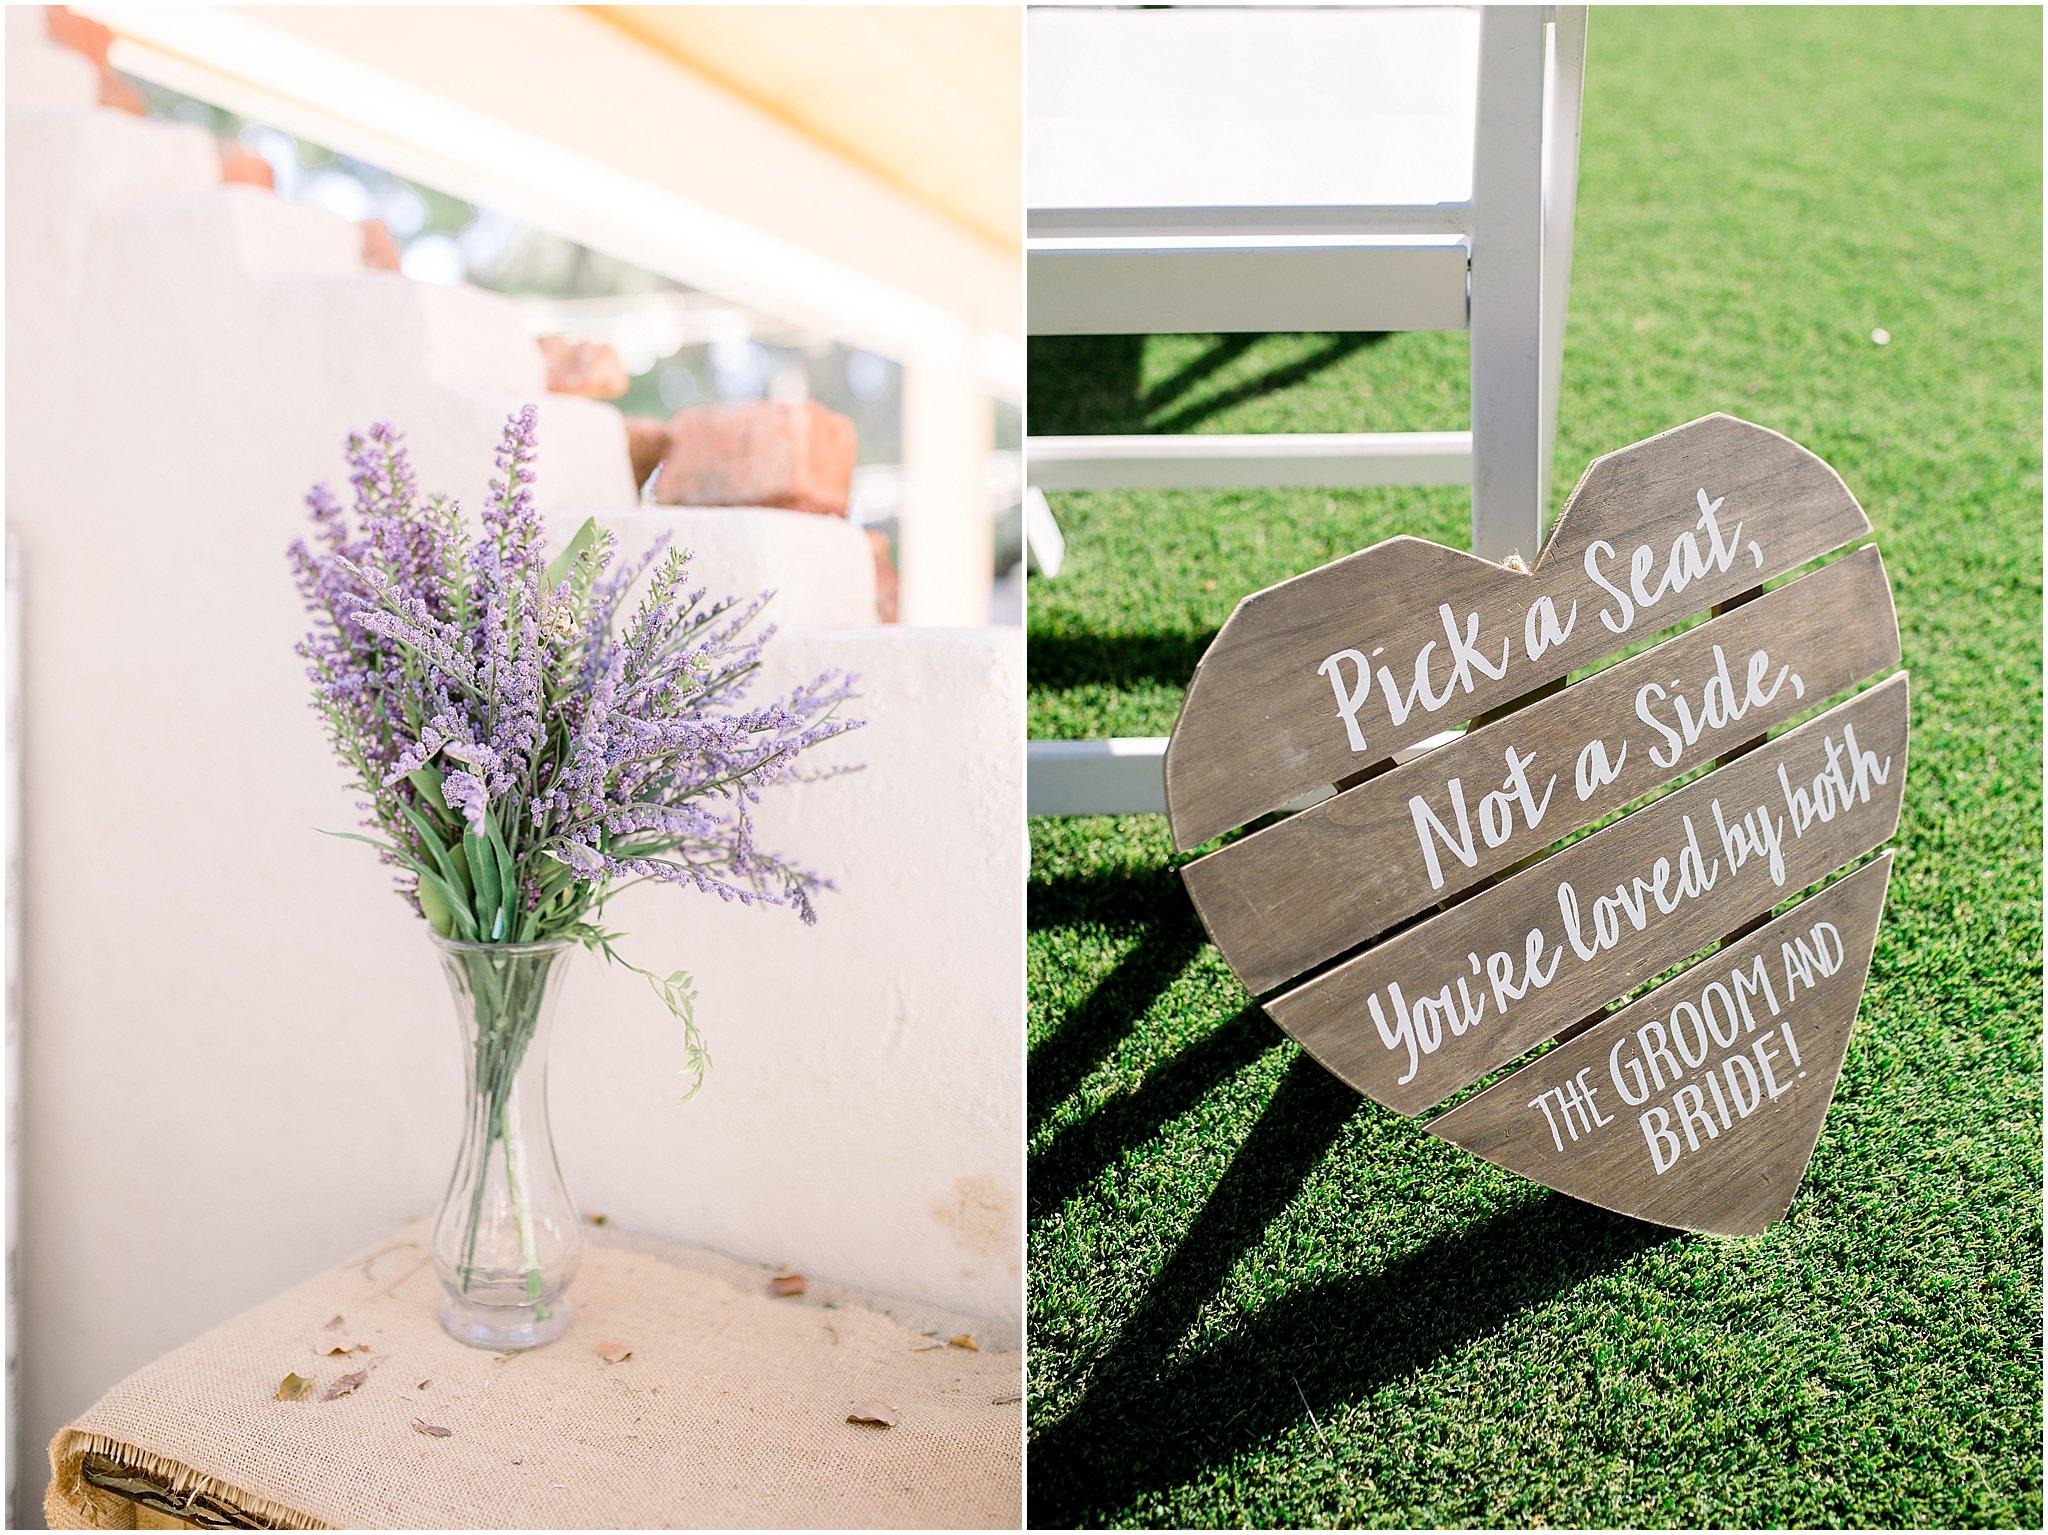 Hyatt-Lodge-Mcdonald-Campus-Wedding_0079.jpg